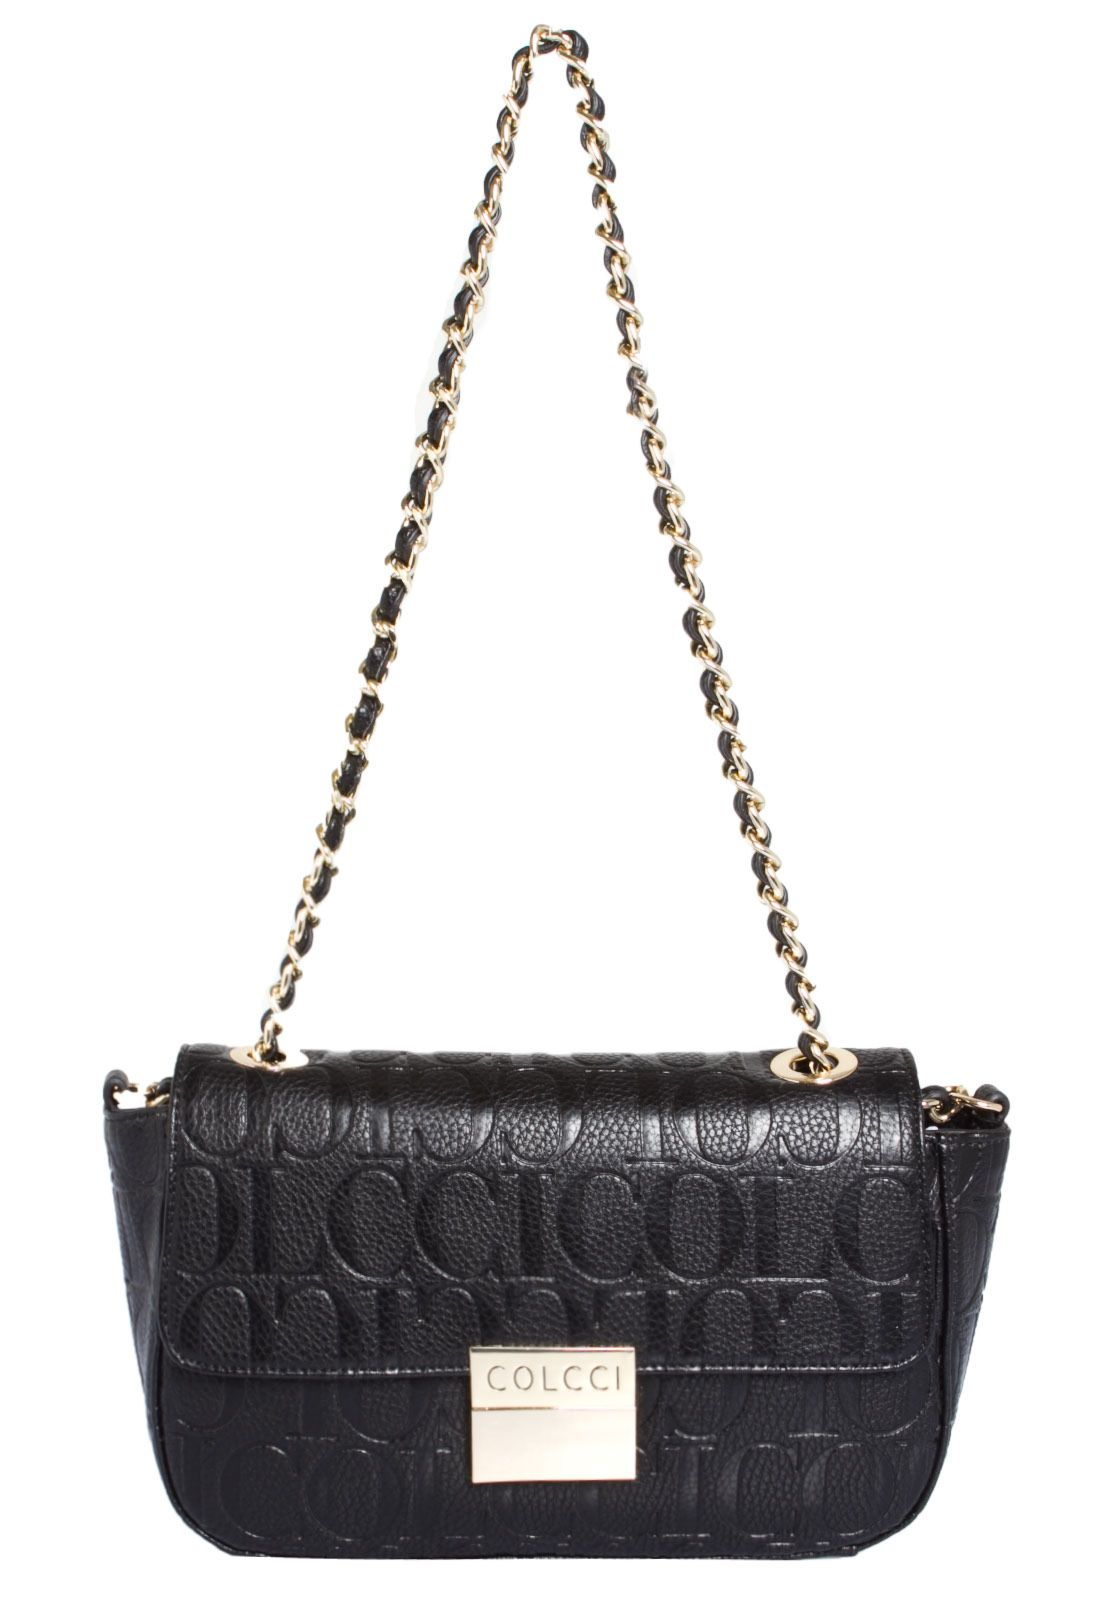 Bolsa Colcci Preta - Compre Agora   Dafiti Brasil   DESIGNER ... 303bd45fe9